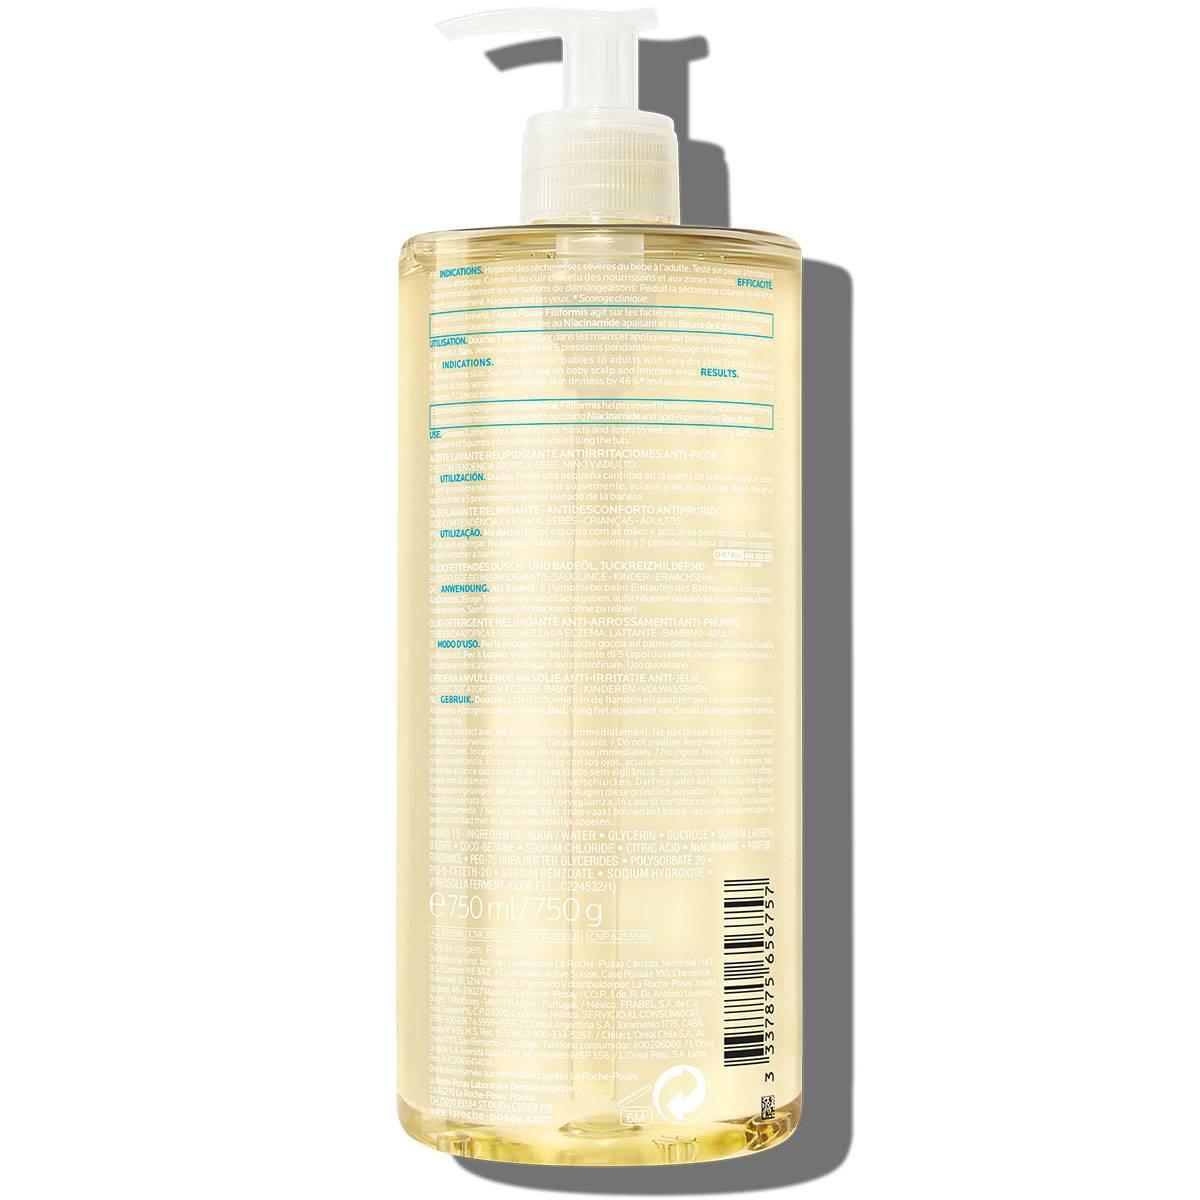 Larocheposay ProductPage Eczema Lipikar Cleansing Oil AP 750ml 3337875